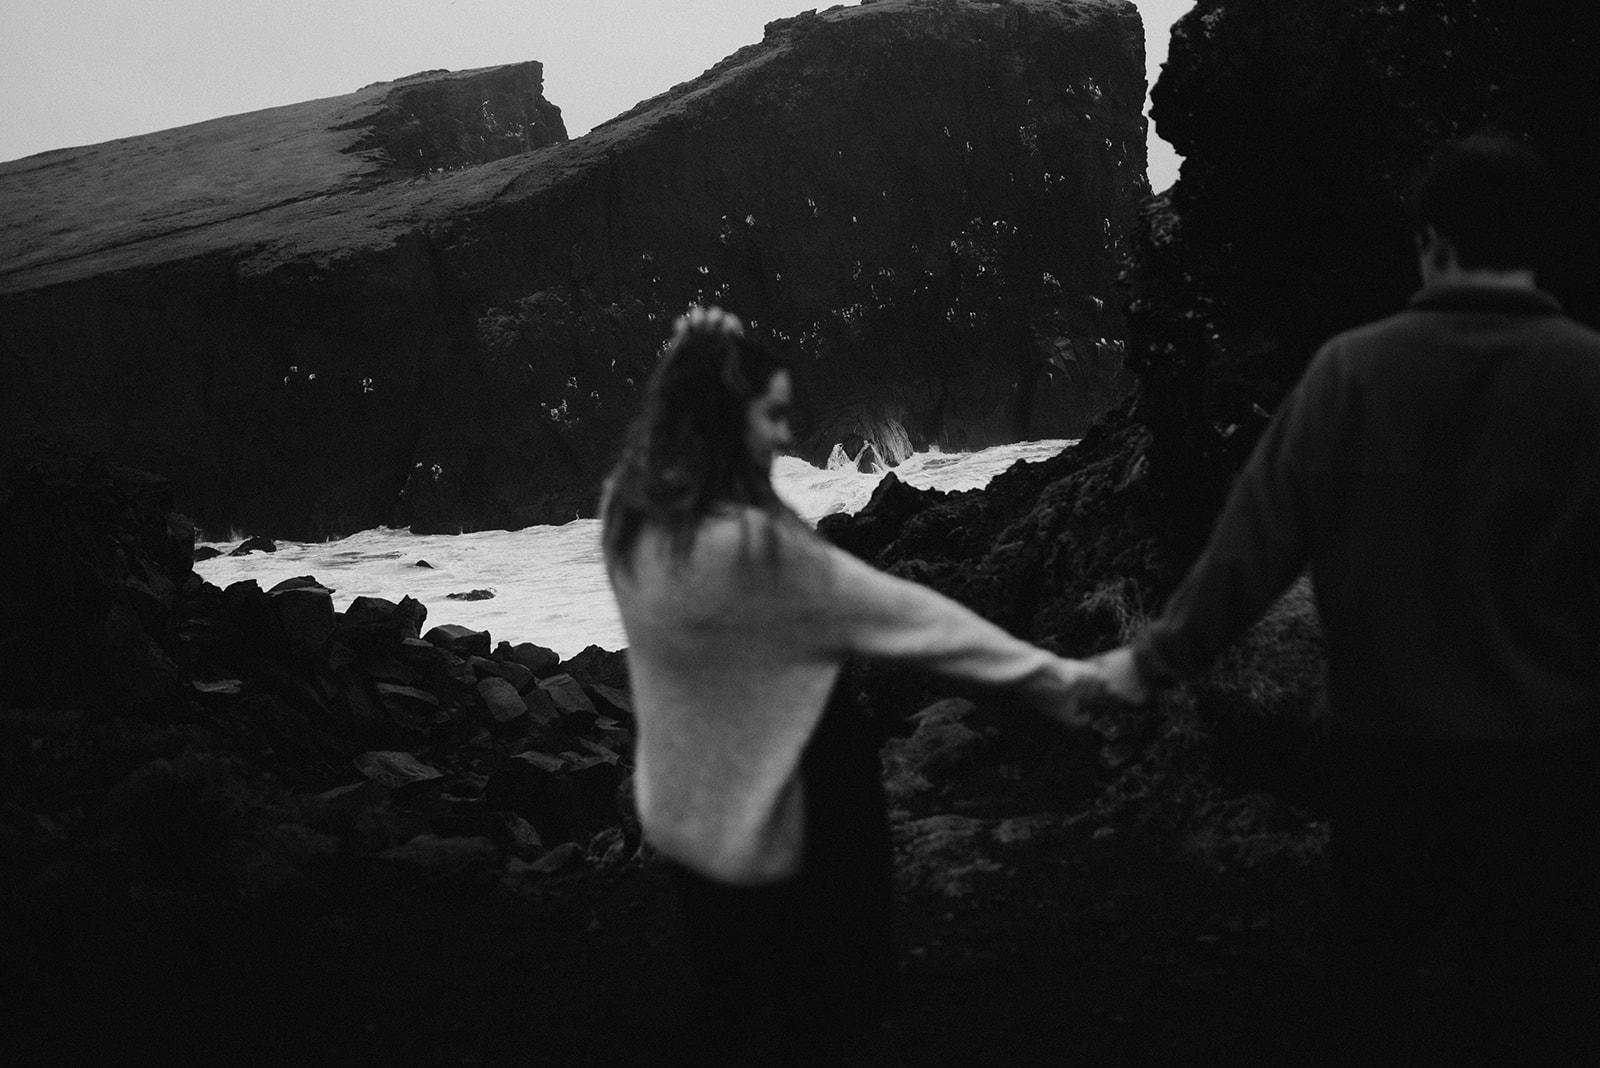 Mack & Michael - Sesja na Islandii 7 alebosco islandia mm 6